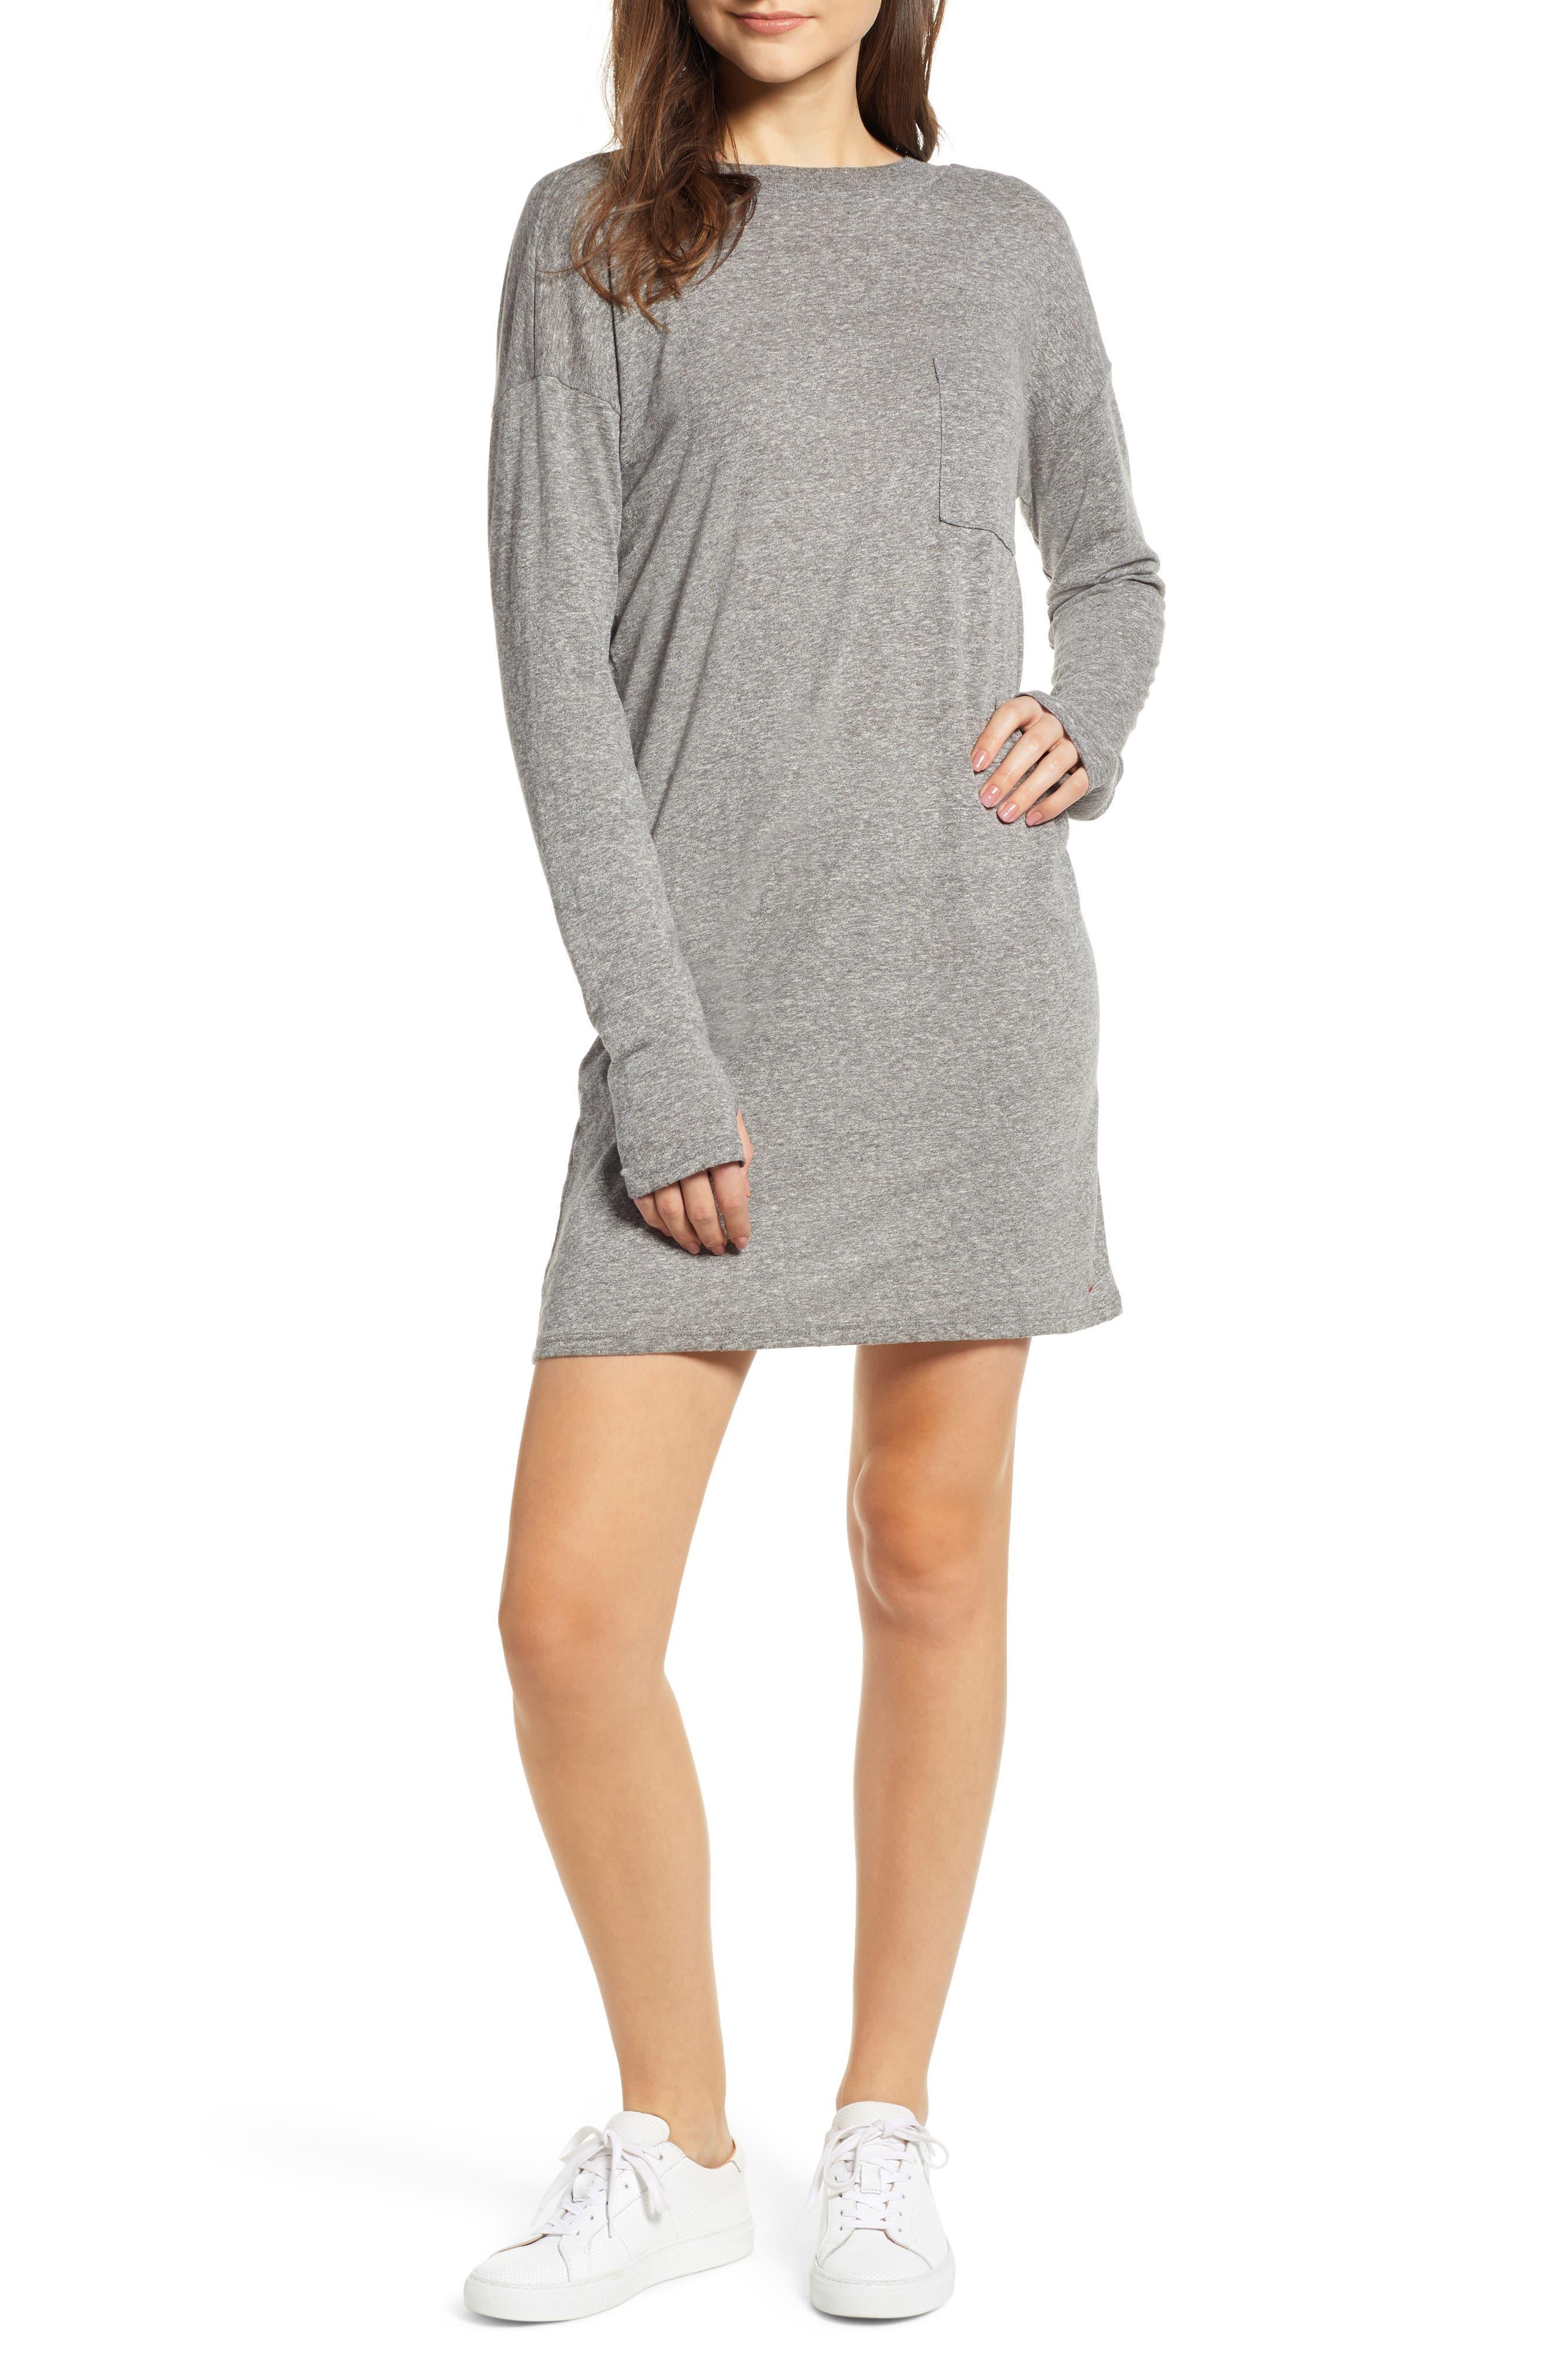 N PHILANTHROPY Cairo Knit Dress in Heather Grey